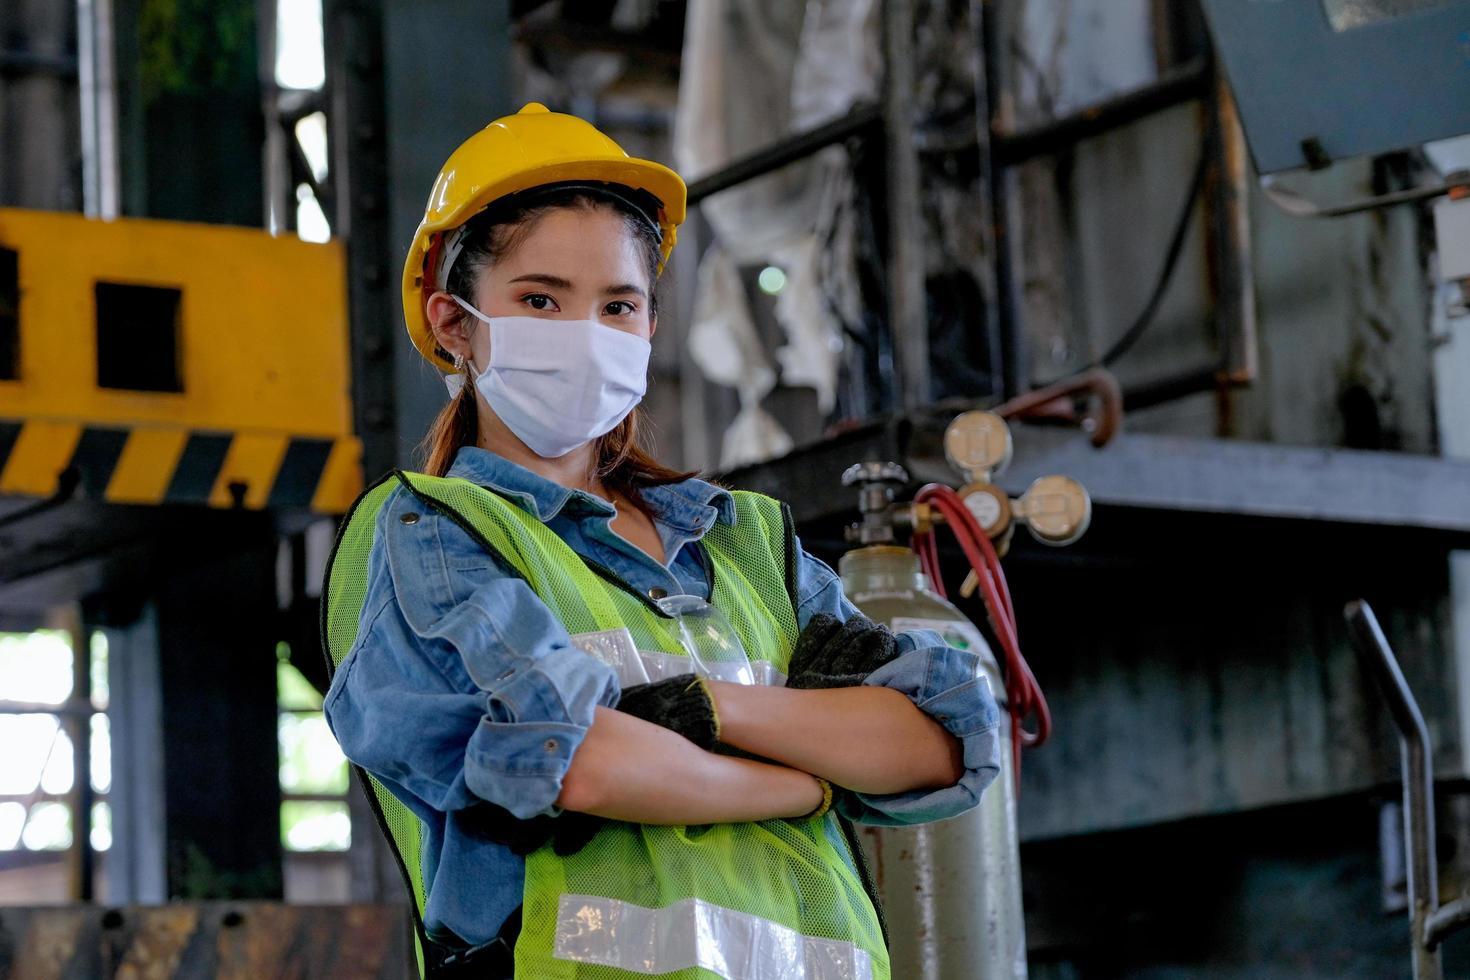 fabrieksvrouw staat op haar werkplek foto